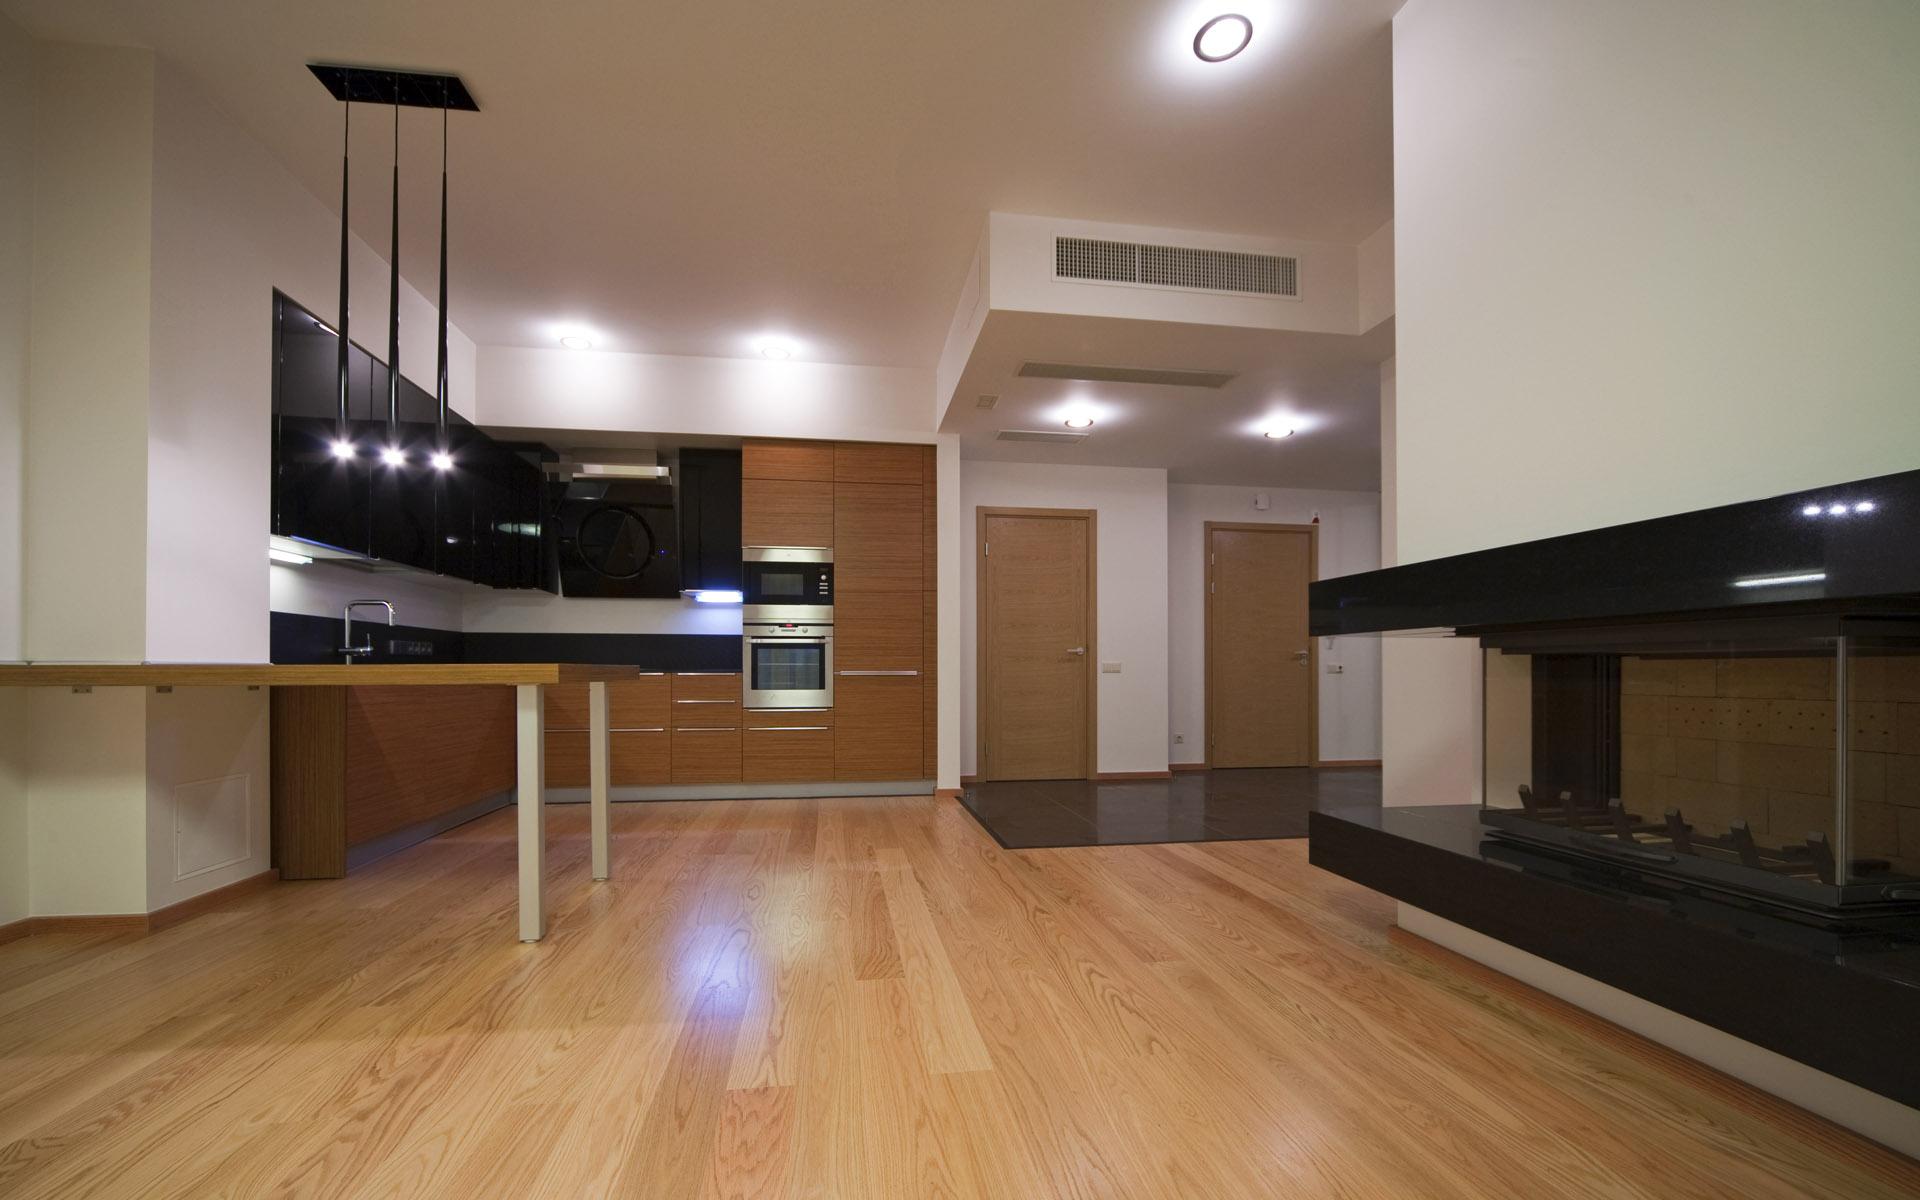 large-kitchen-interior-design-lighting large kitchen interior design lighting